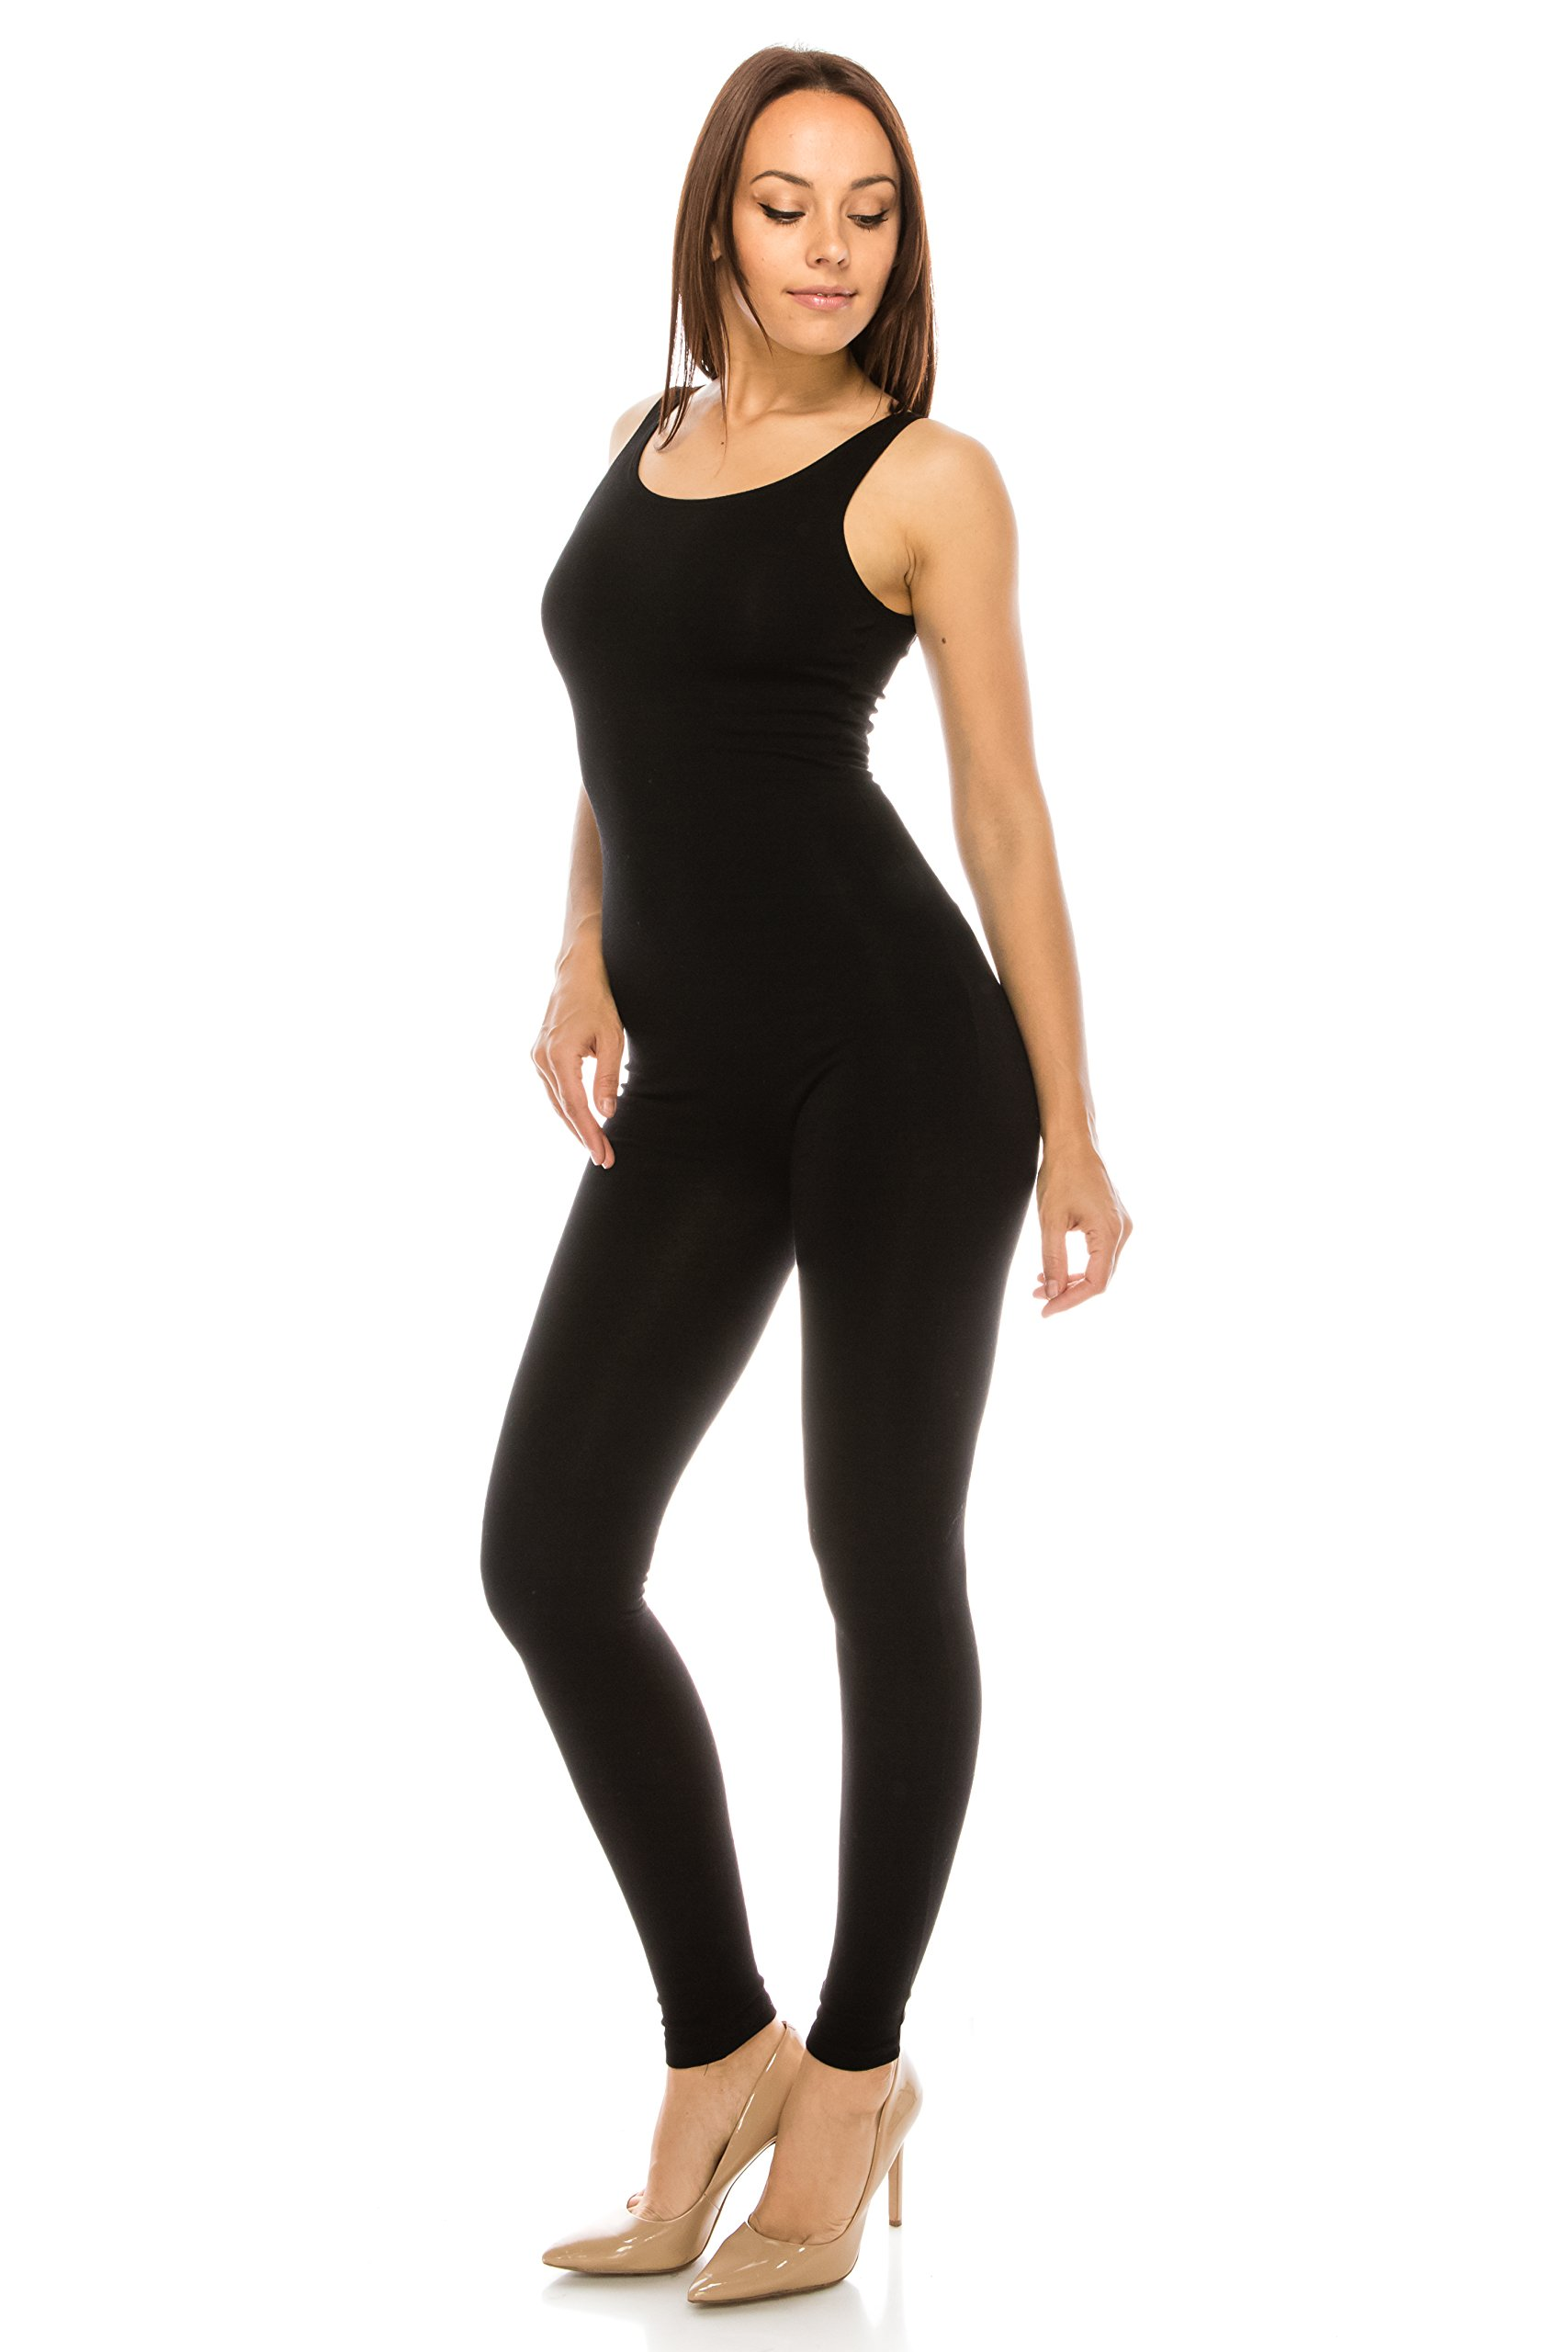 CNC STYLE Women Active Plus n Regular Size Stretch Yoga Sleeveless One Piece Unitard Bodysuit Jumpsuit Playsuit (1XL, Black)